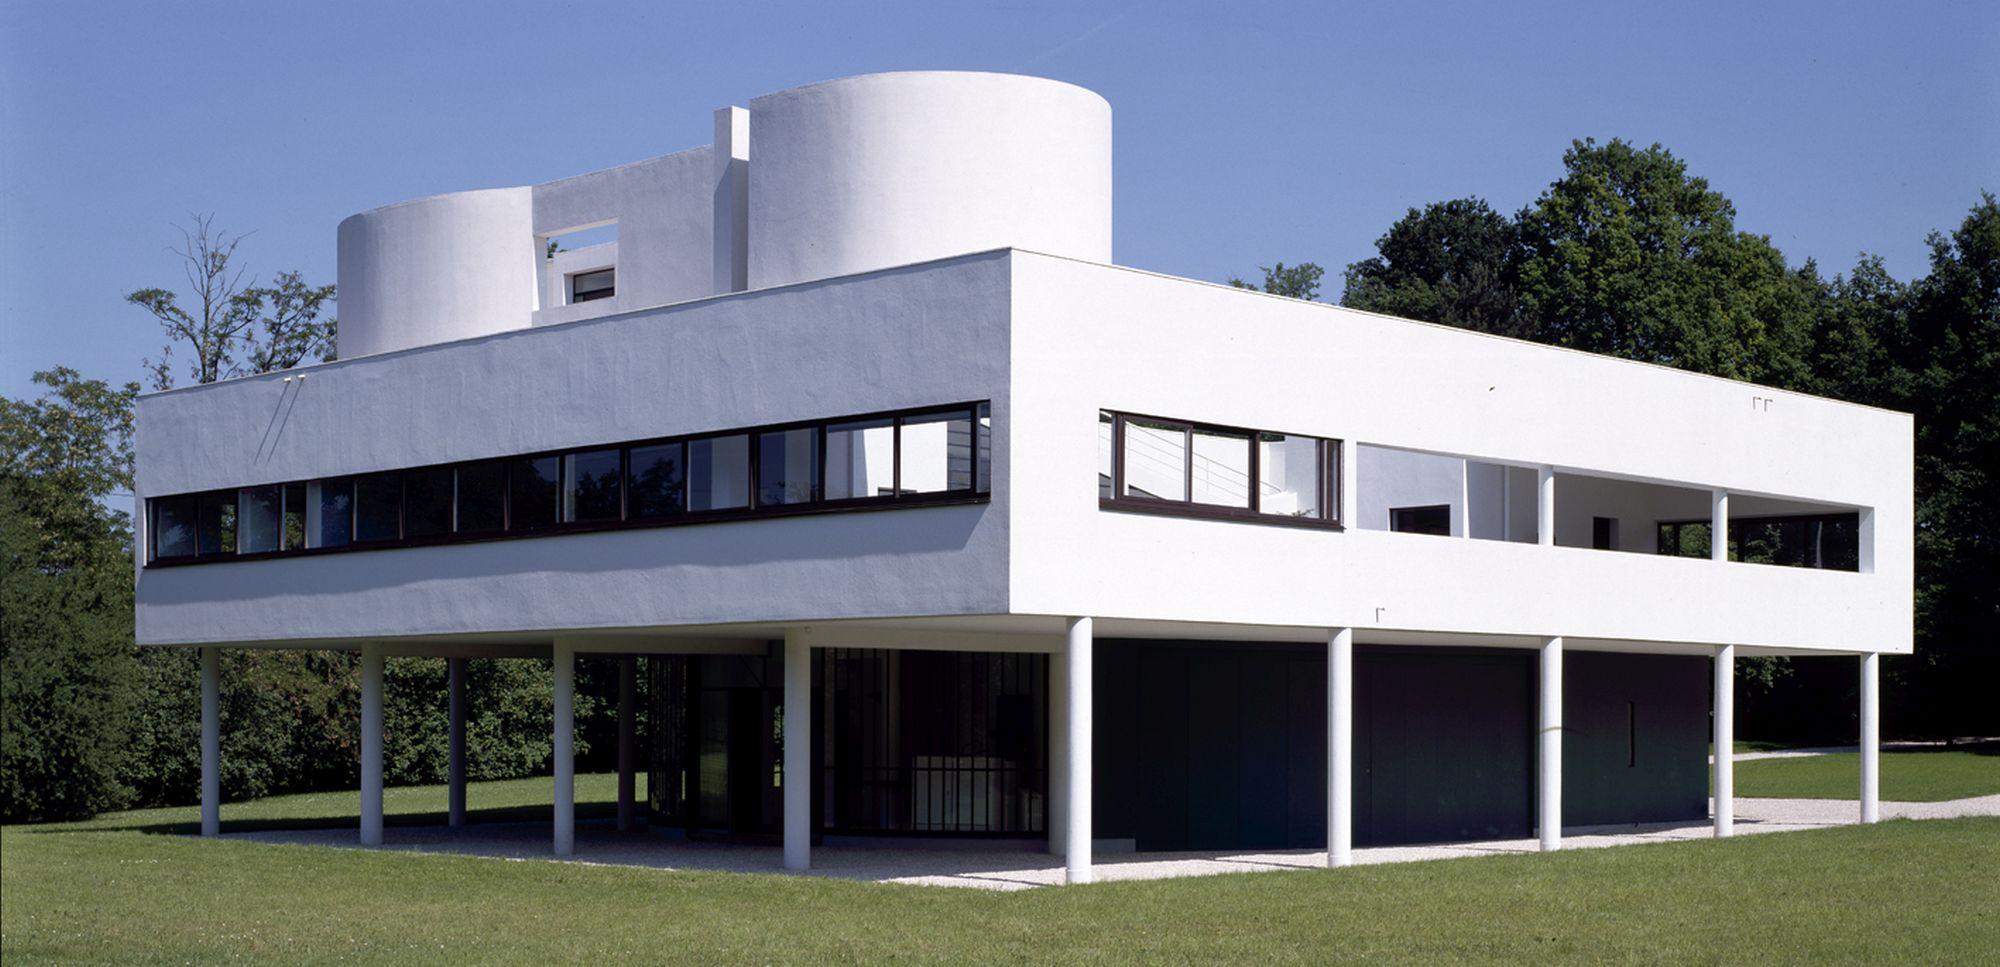 Das Werk von Le Corbusier - UNESCO-Weltkulturerbe